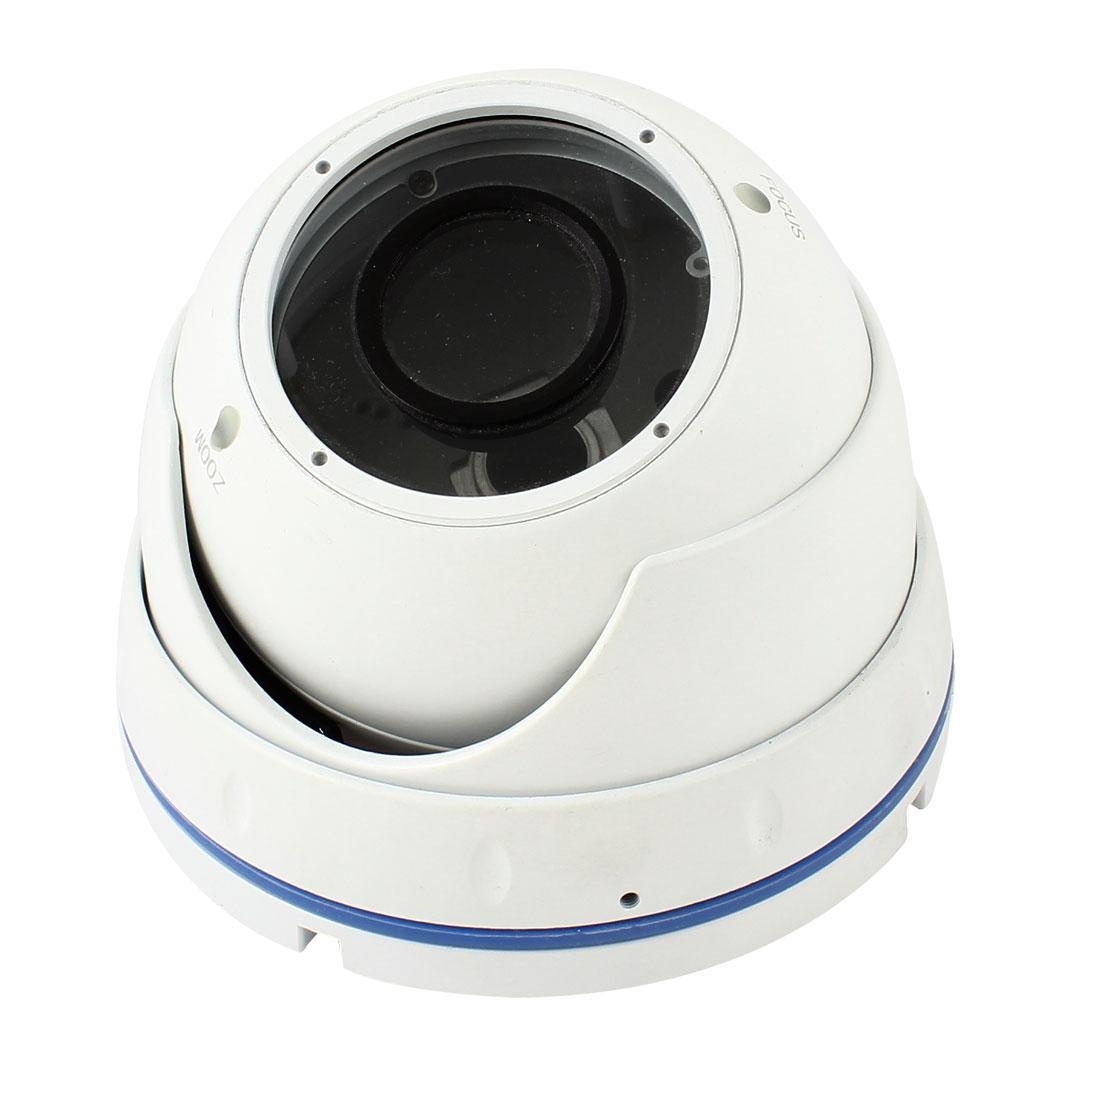 Surveillance White Metal CCTV Zoom Dome Camera Housing Case 12cm Dia